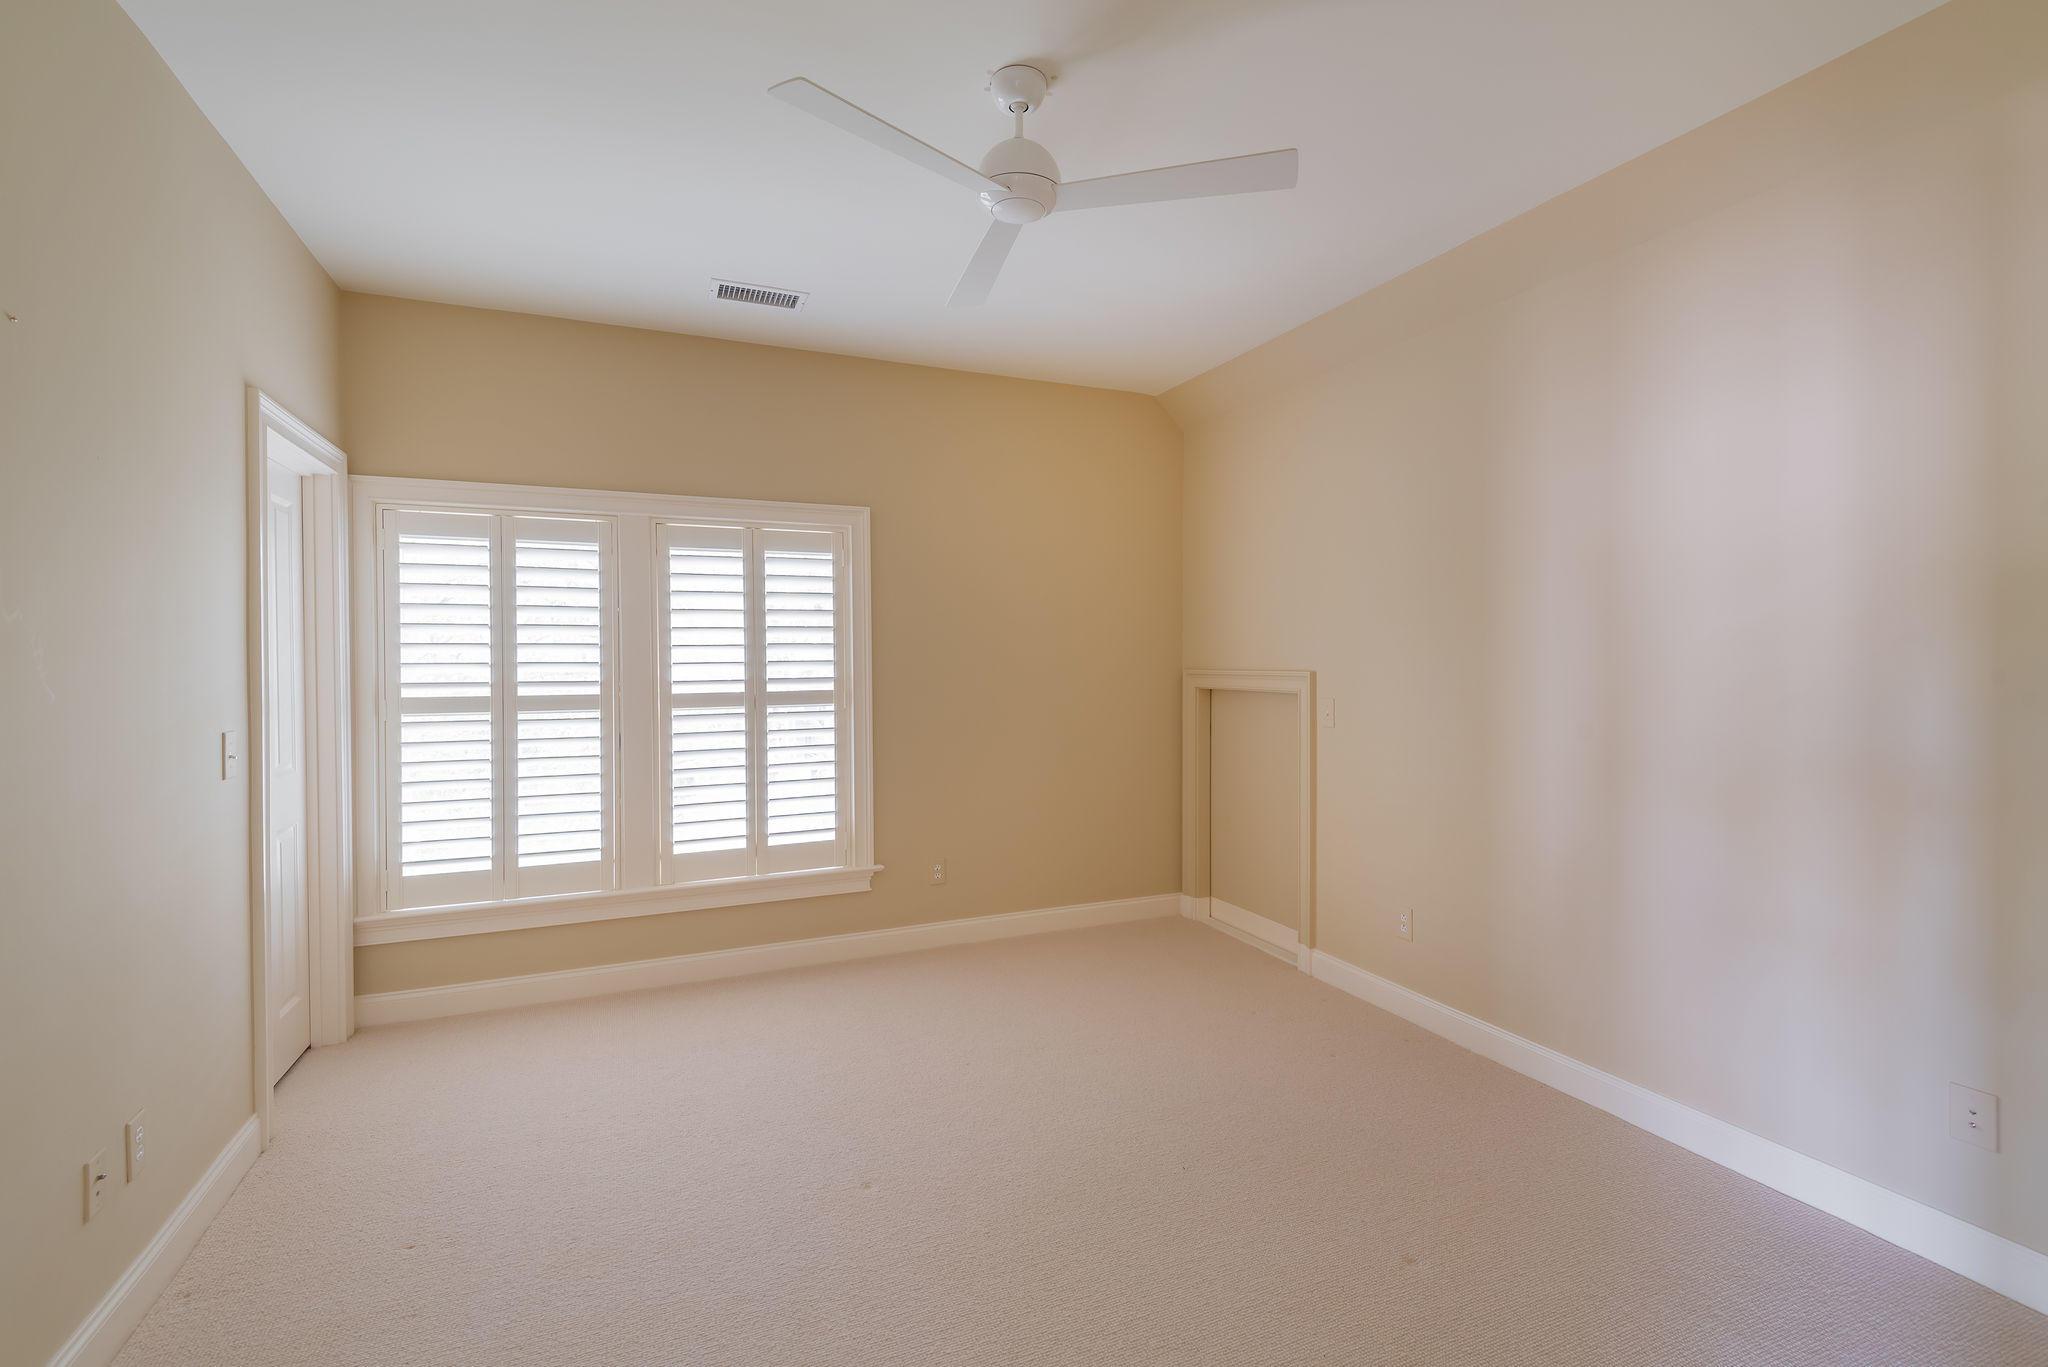 Kiawah Island Homes For Sale - 3 Grey Widgeon, Kiawah Island, SC - 27